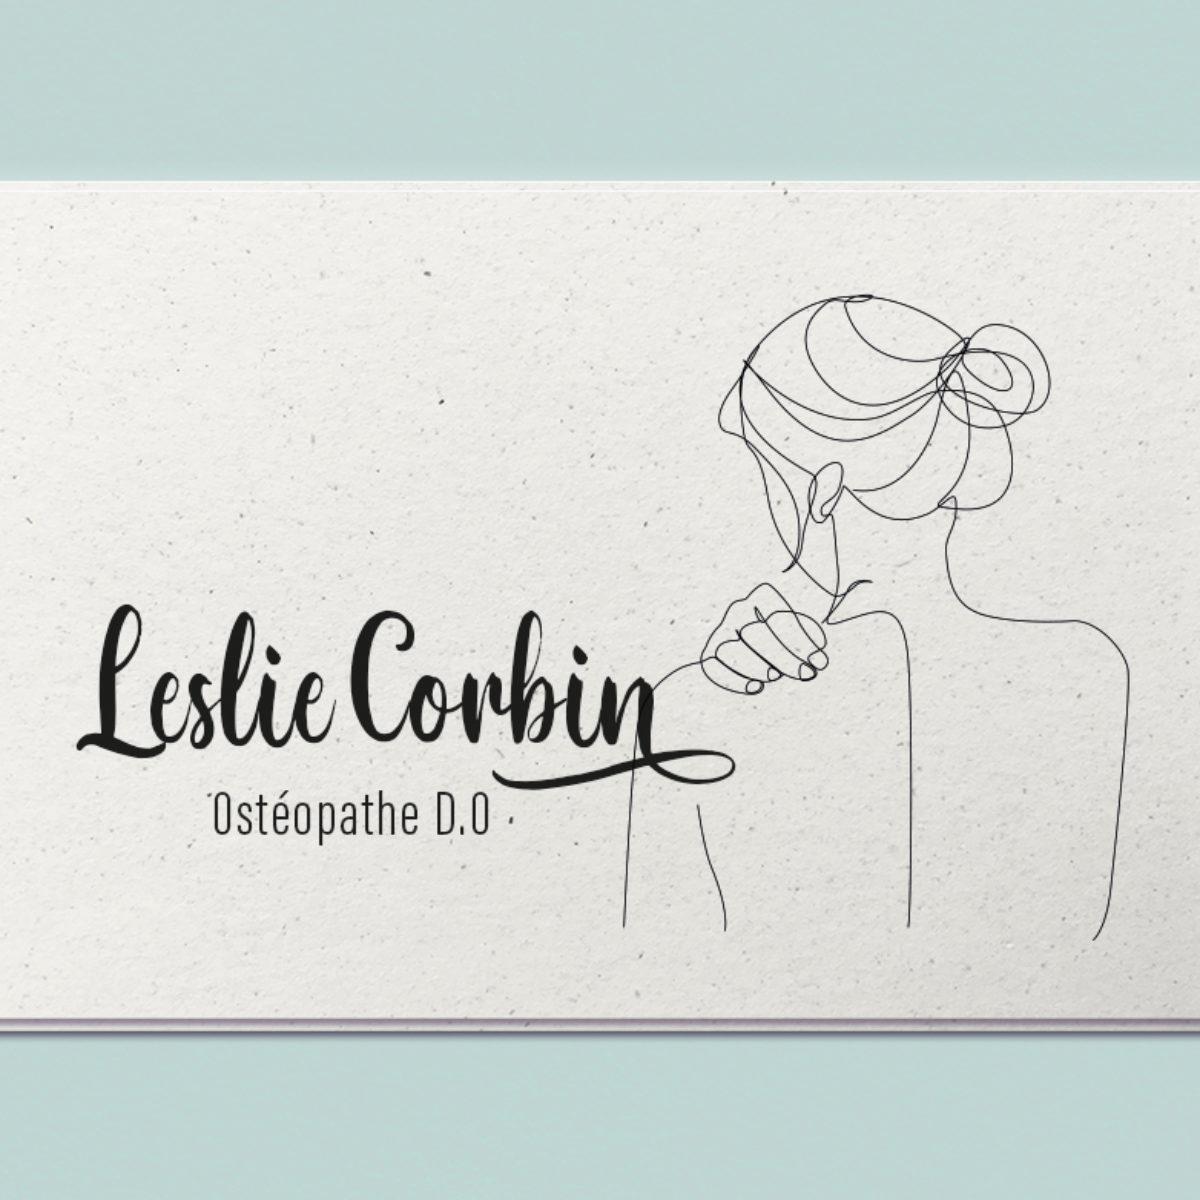 Leslie Corbin